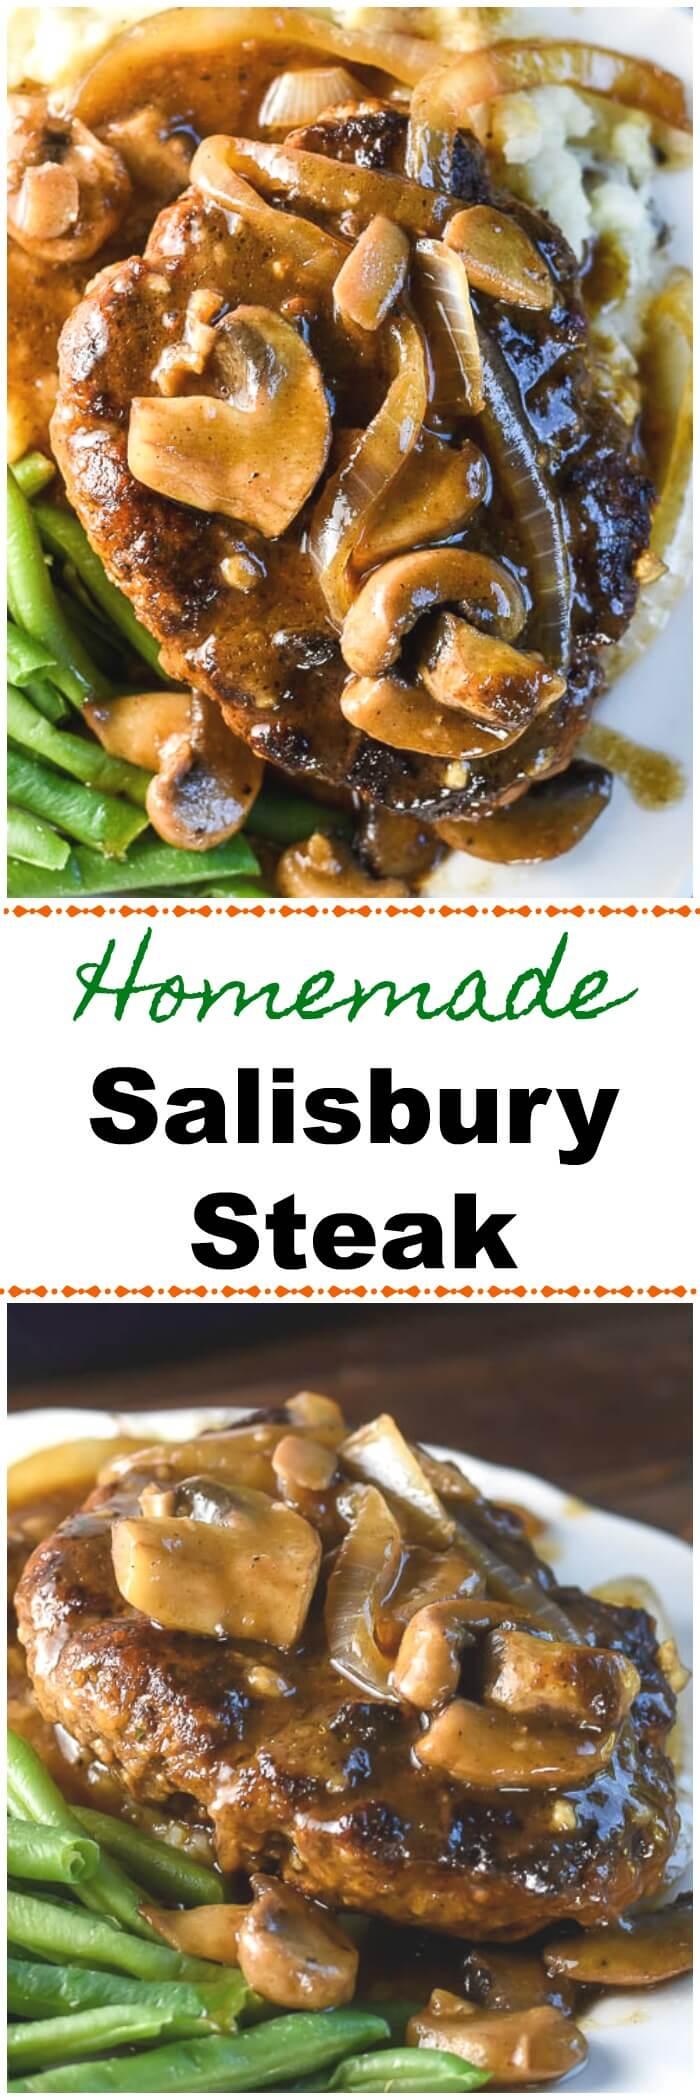 Salisbury Steak Homemade with onions, mushrooms and brown gravy.